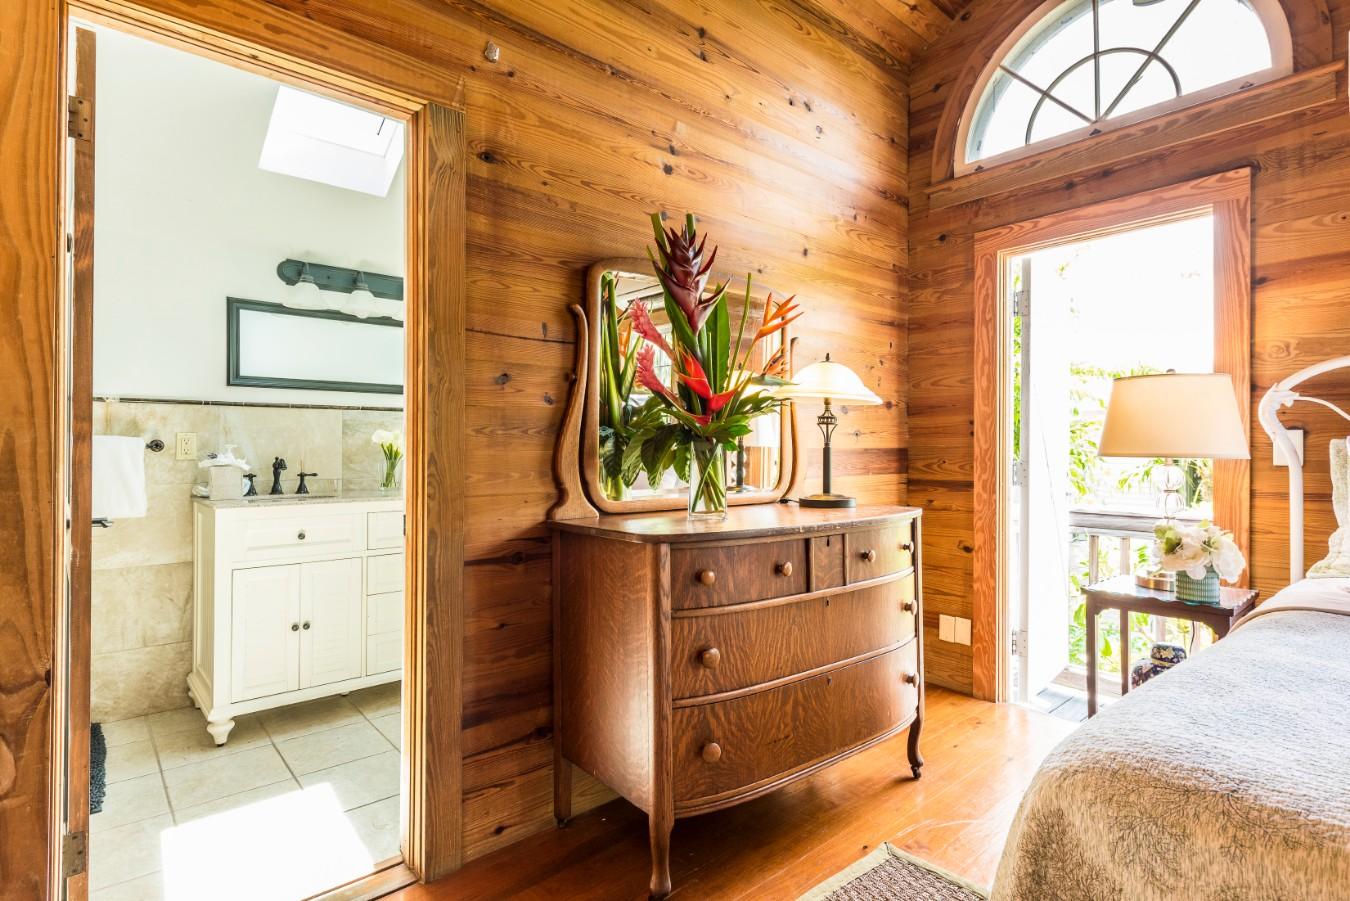 Key West Vacation Home - William Skelton House - Third Floor Master Bedroom